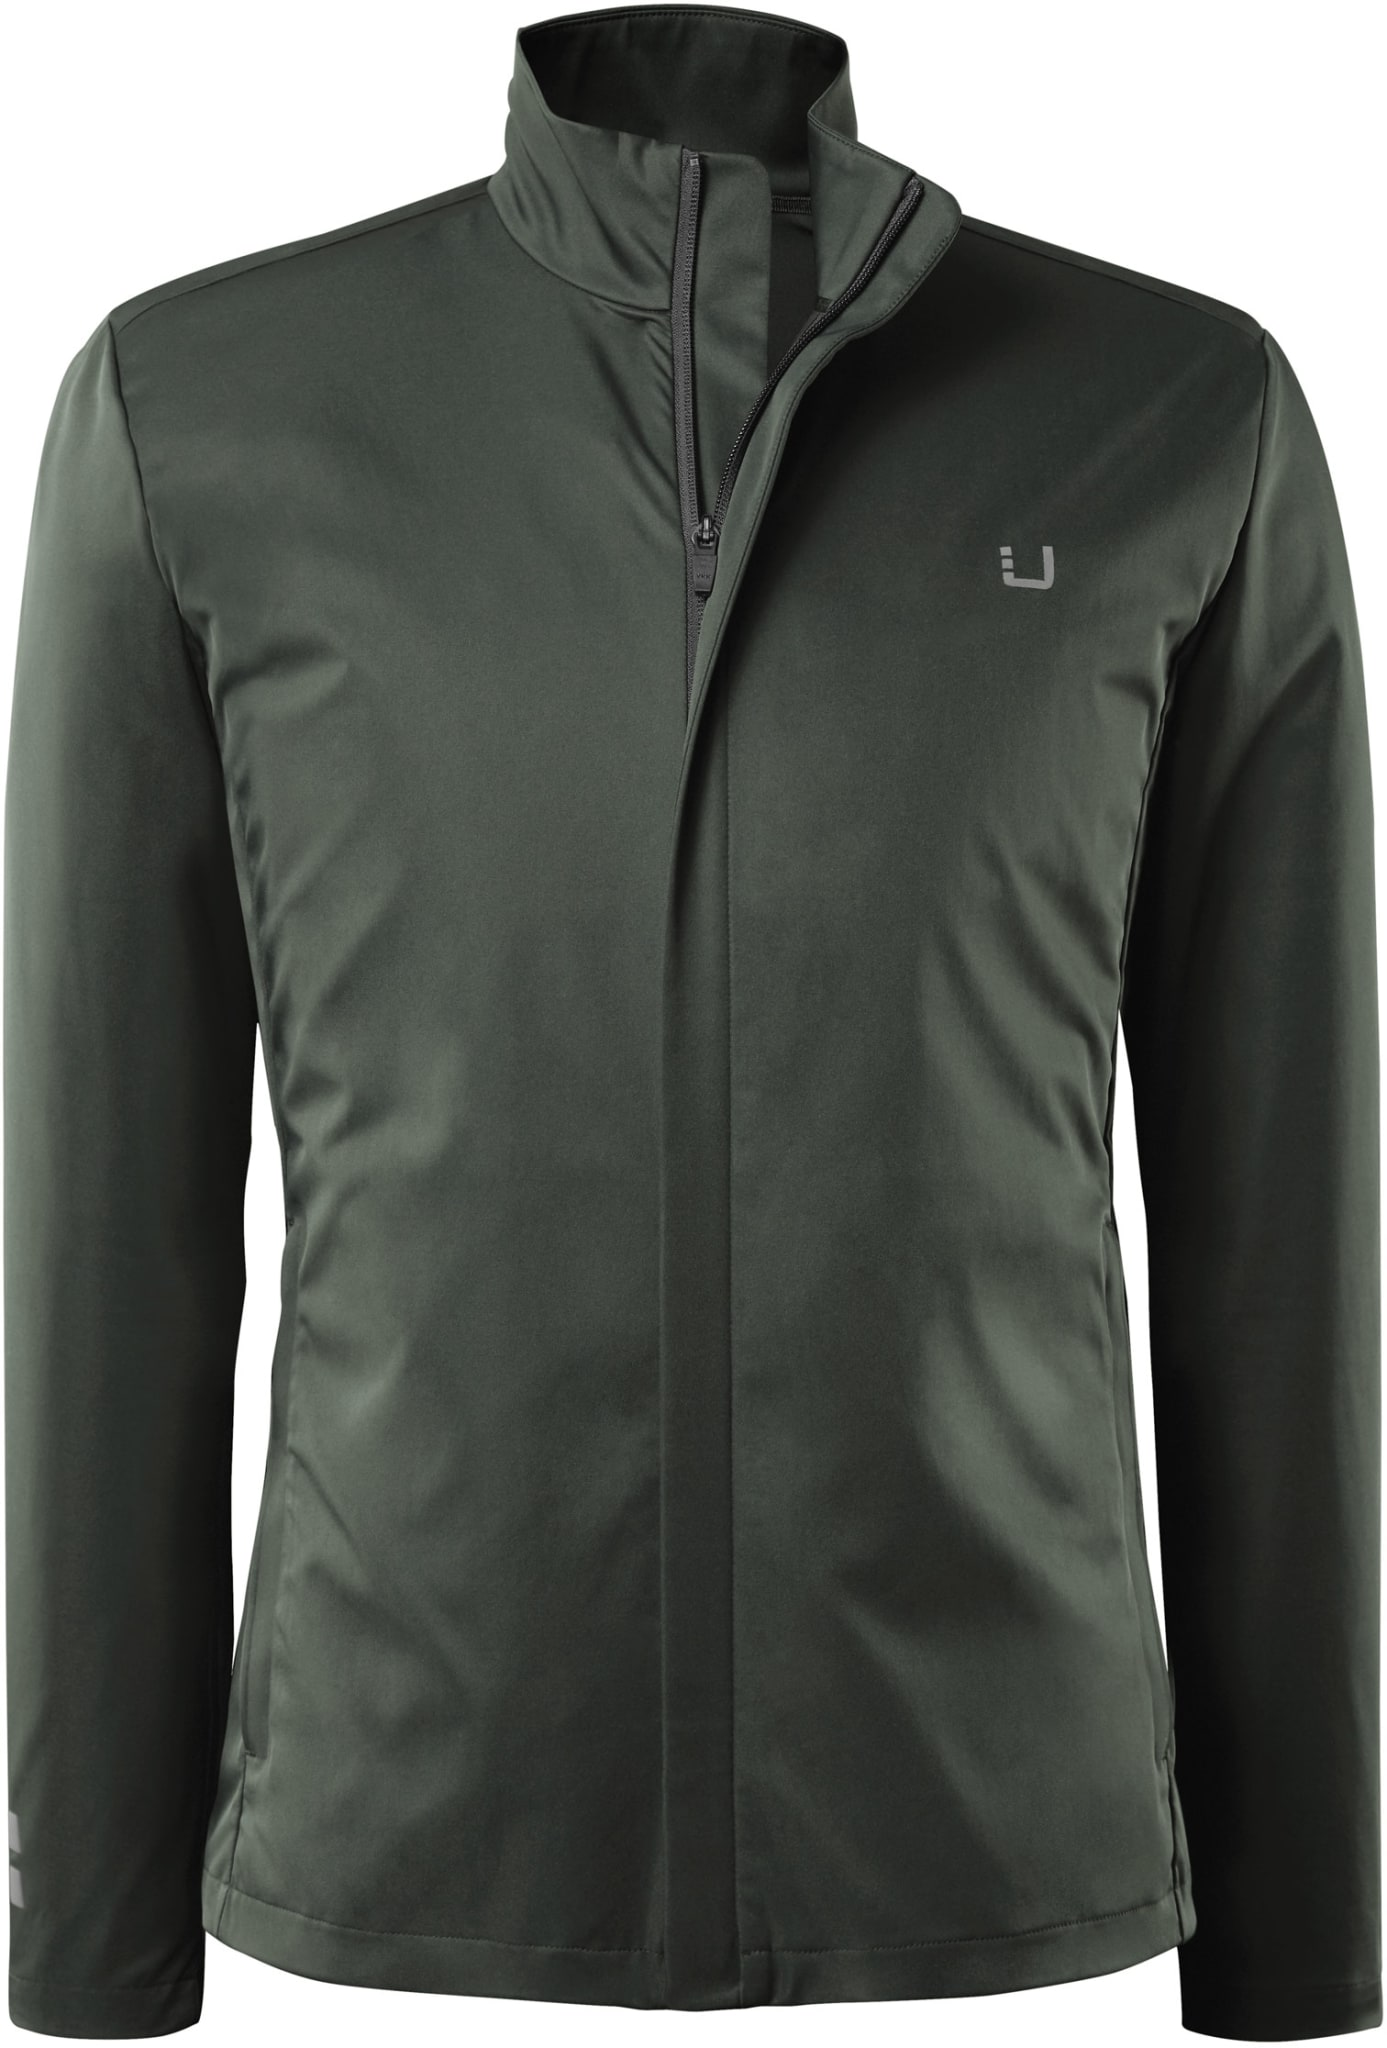 S2 Jacket Ms